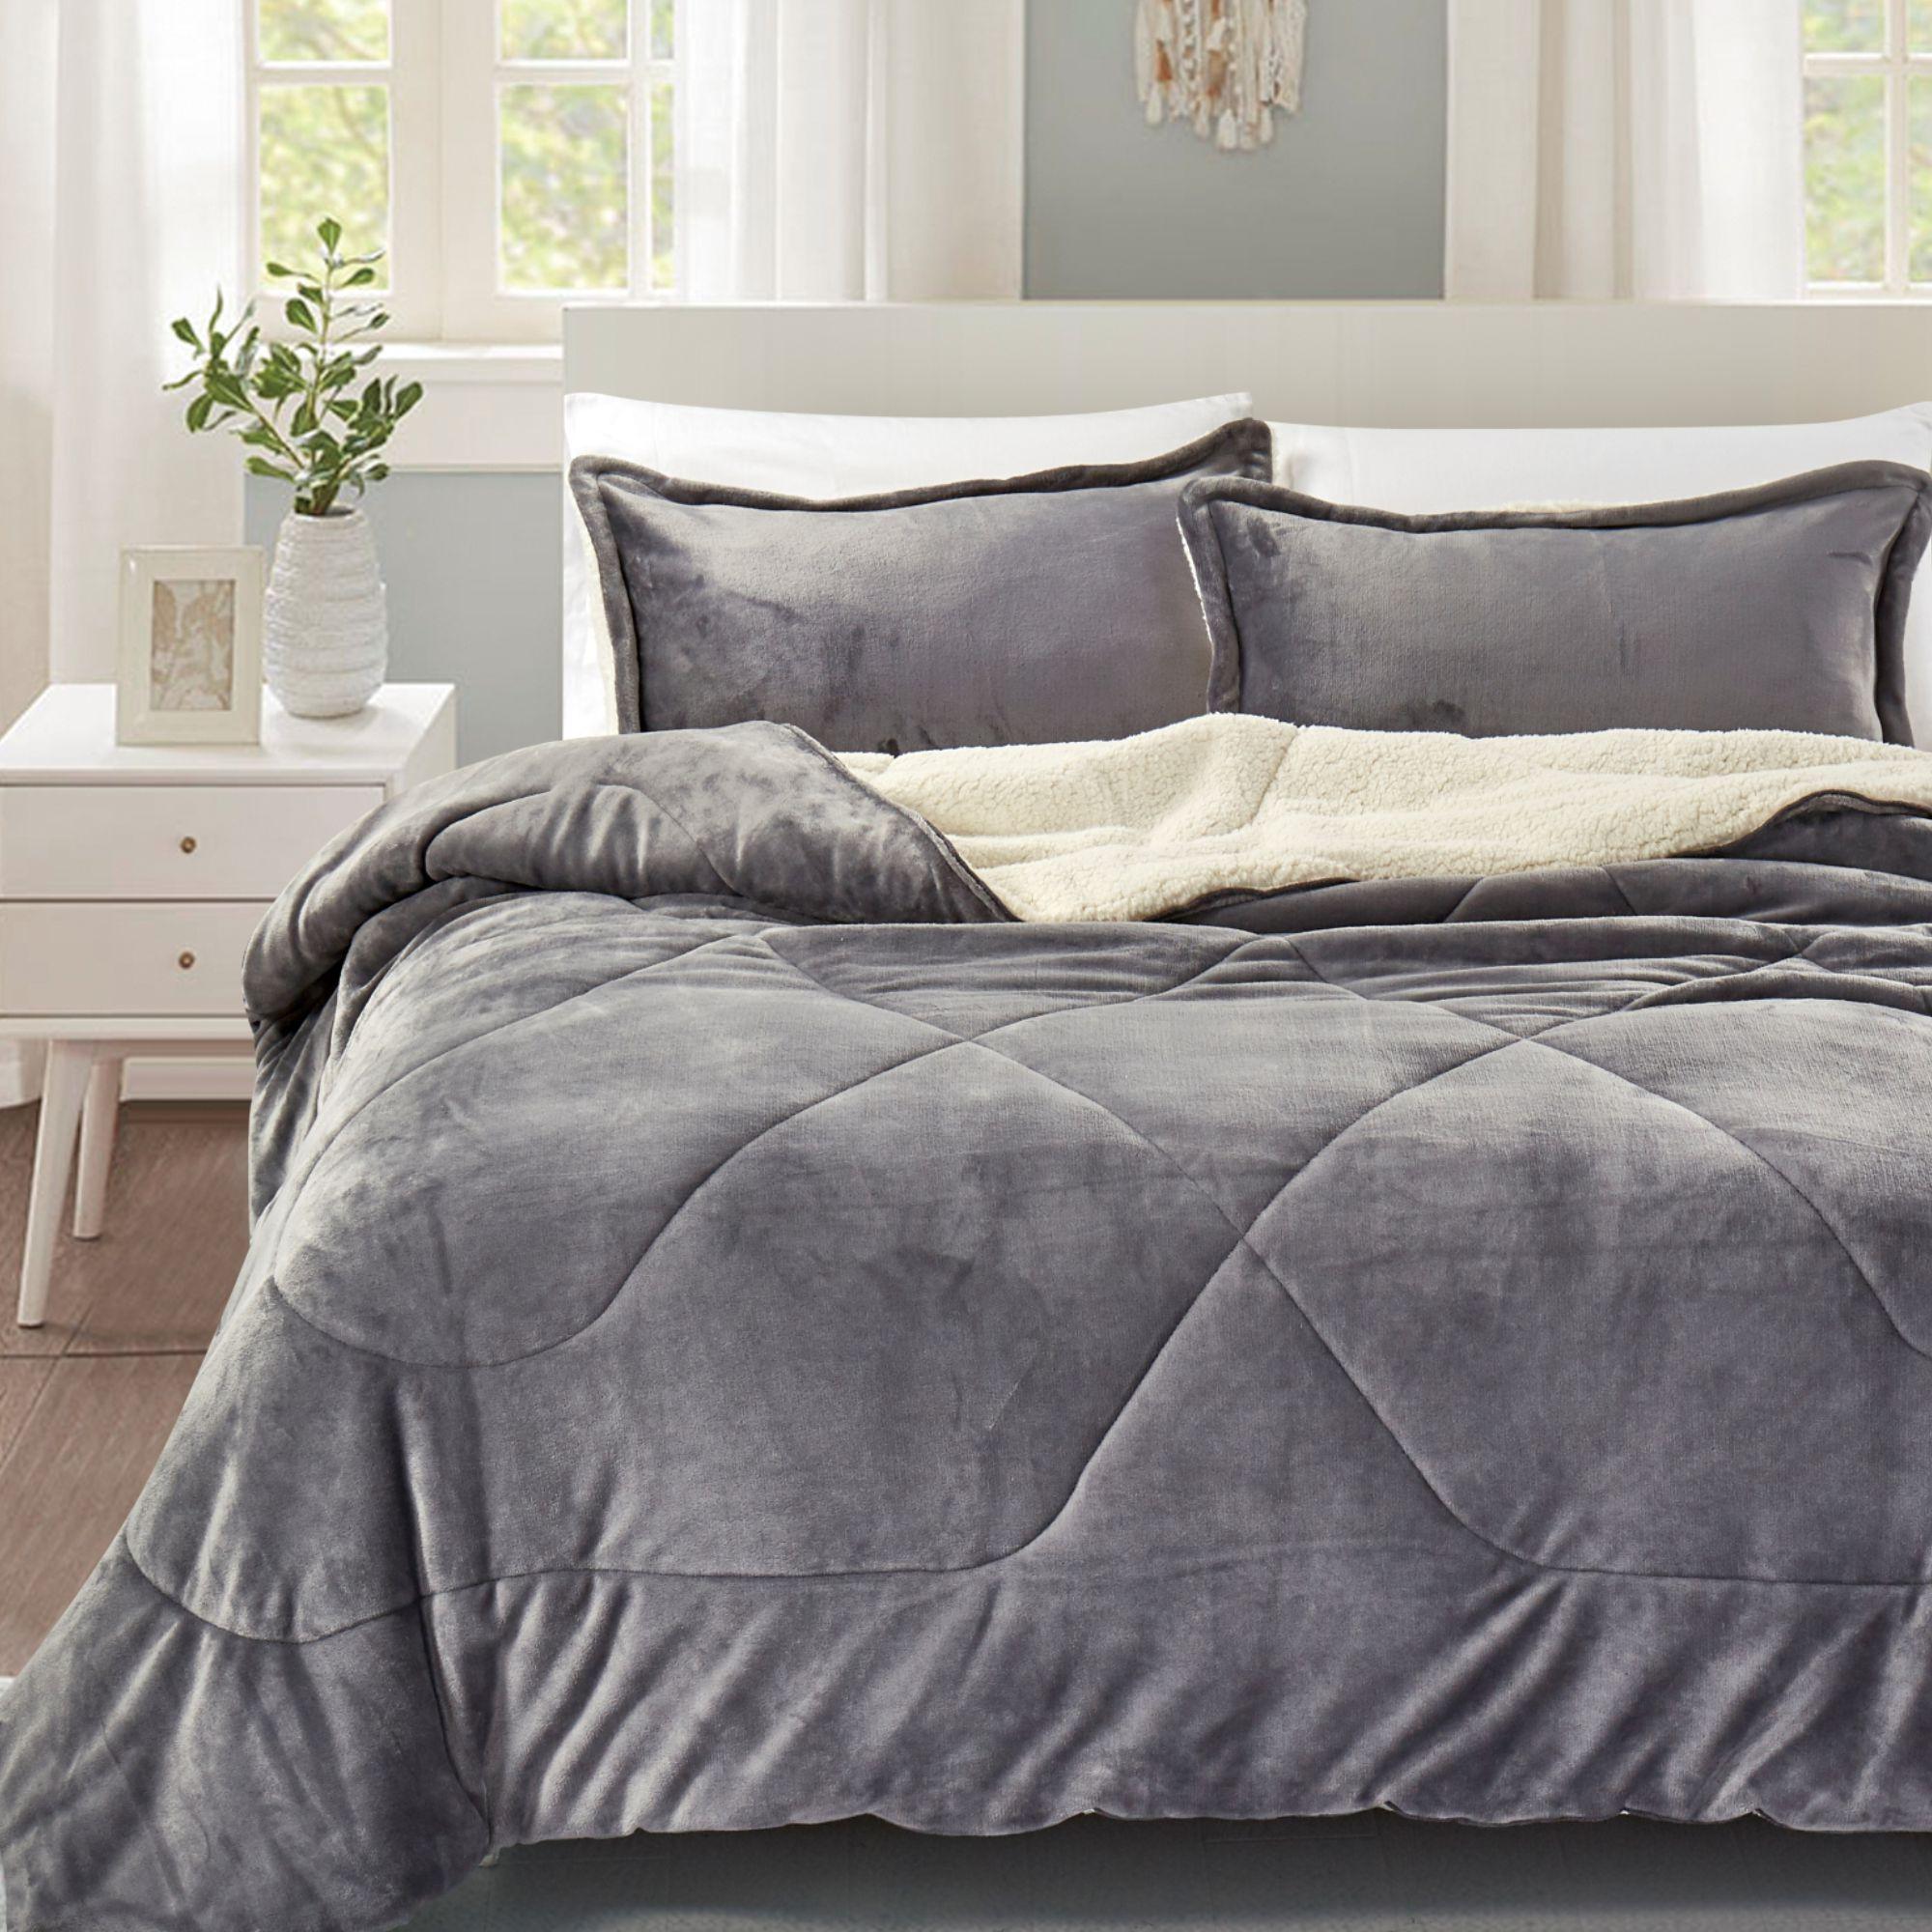 California Design Den Super Soft Cozy Reversible Sherpa Flannel Down Alternative Comforter Set Taupe, Full/Queen 3 Piece